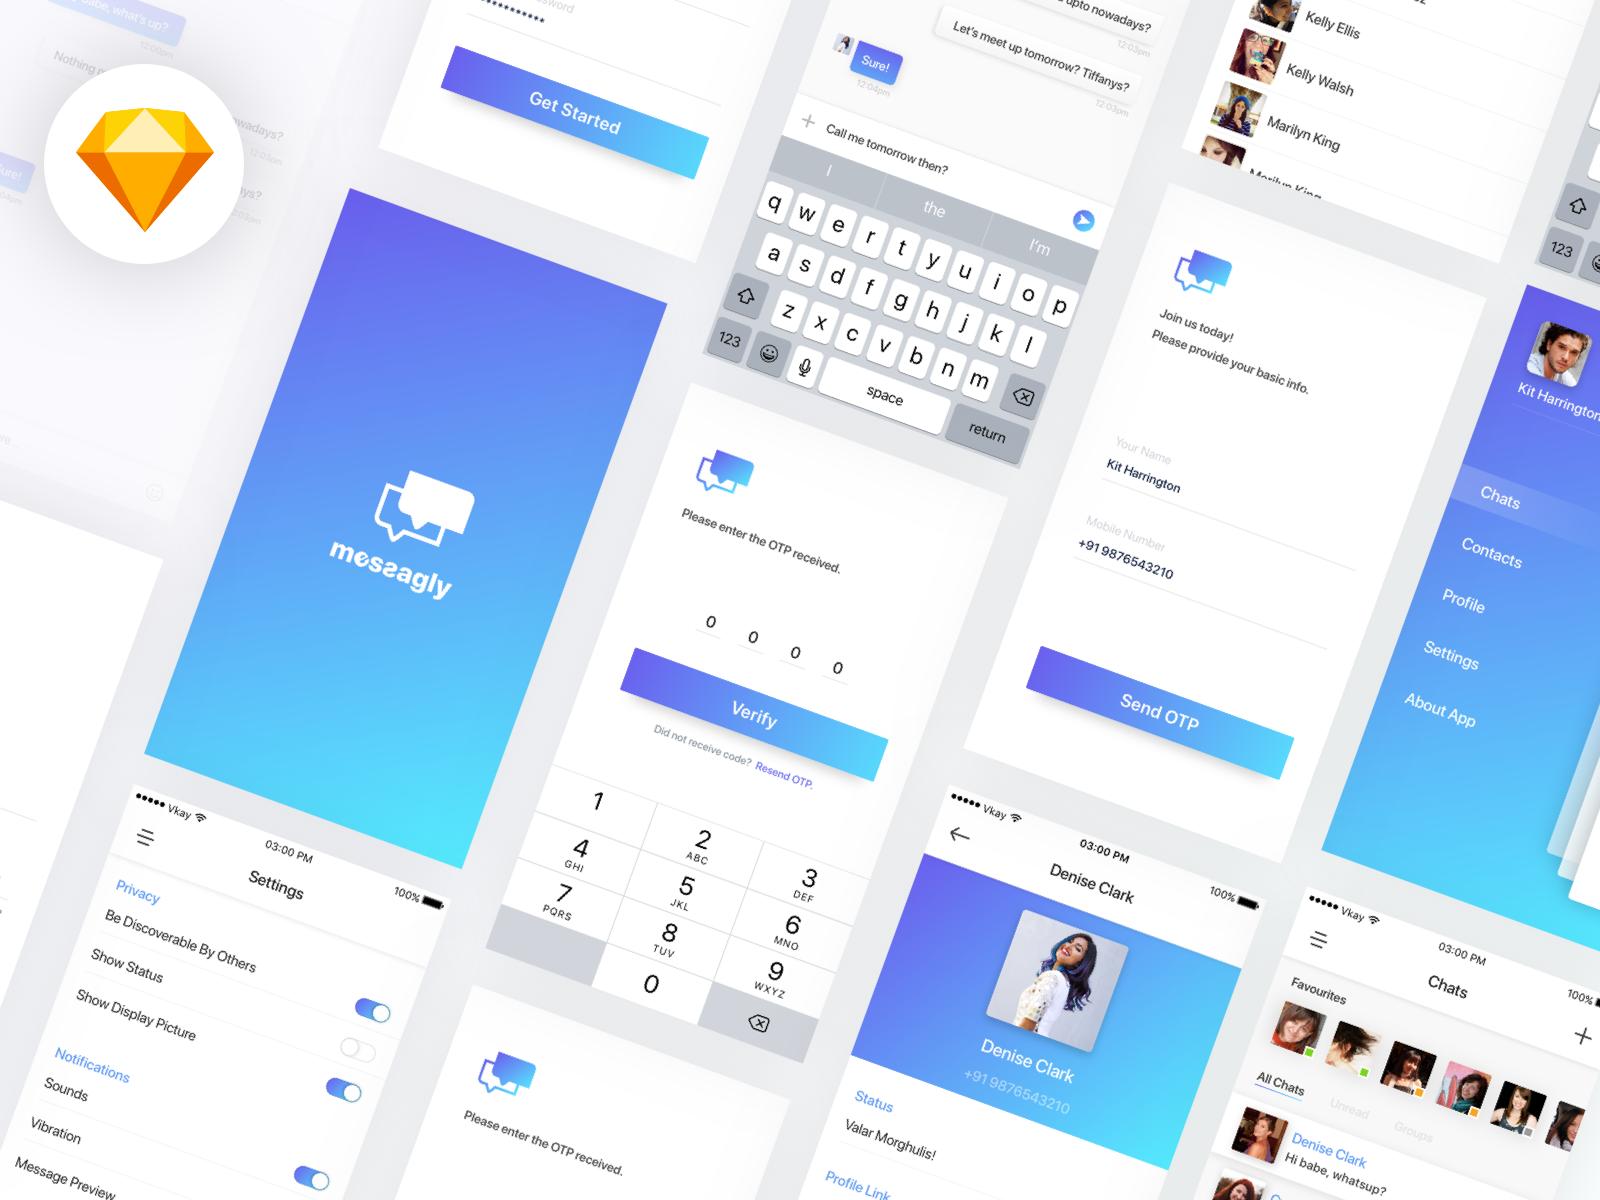 Messagly 聊天类app ui 界面设计sketch素材下载 界面-第1张